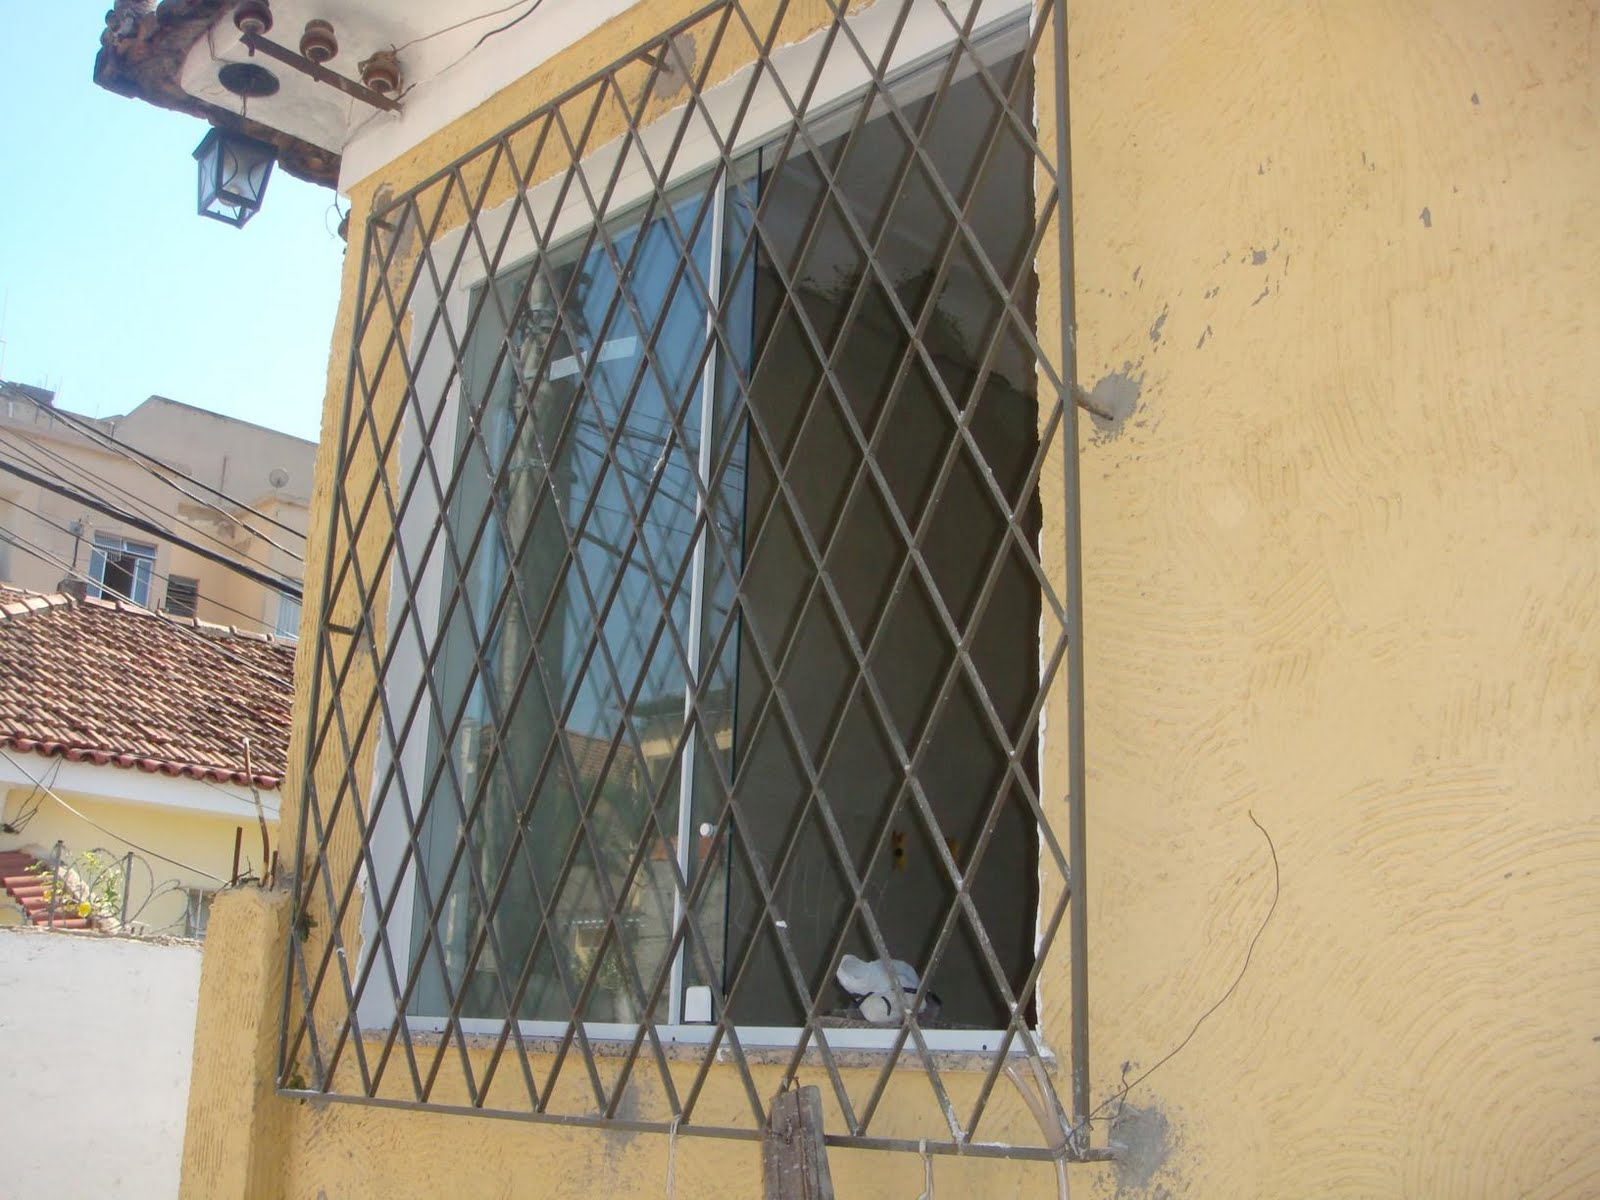 #91733A Lar Primeiro Lar: Janelas 4132 Grade De Aluminio Para Janela Rio De Janeiro